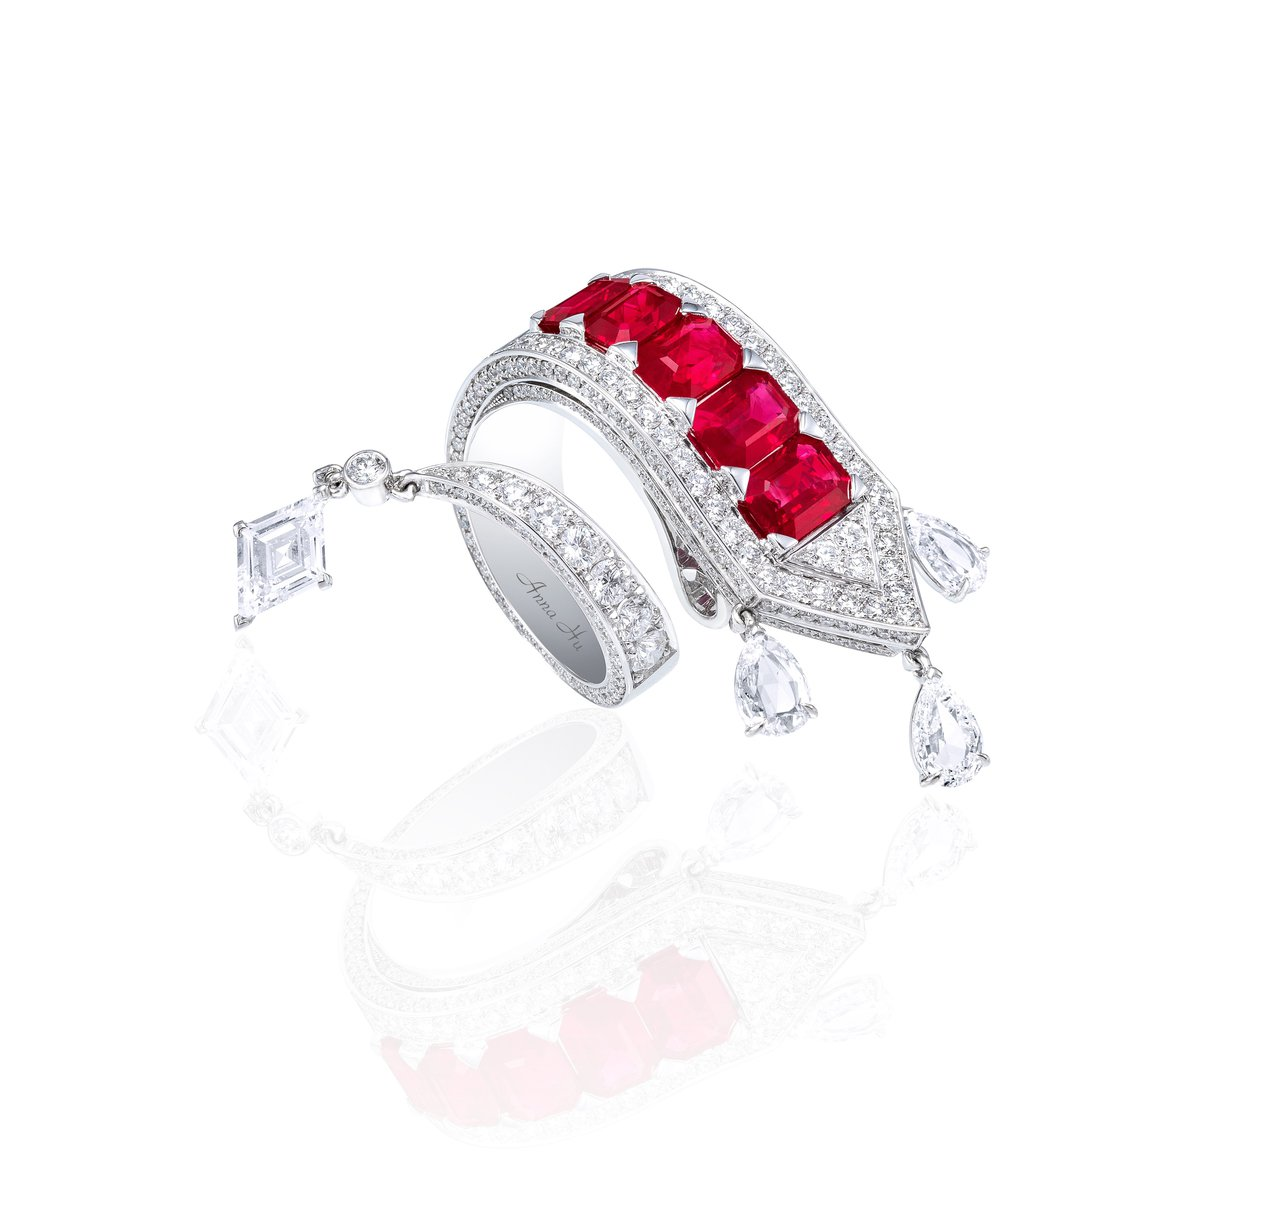 ANNA HU絲路音樂系列熱情 (Appassionata) 紅寶戒指,約81萬...